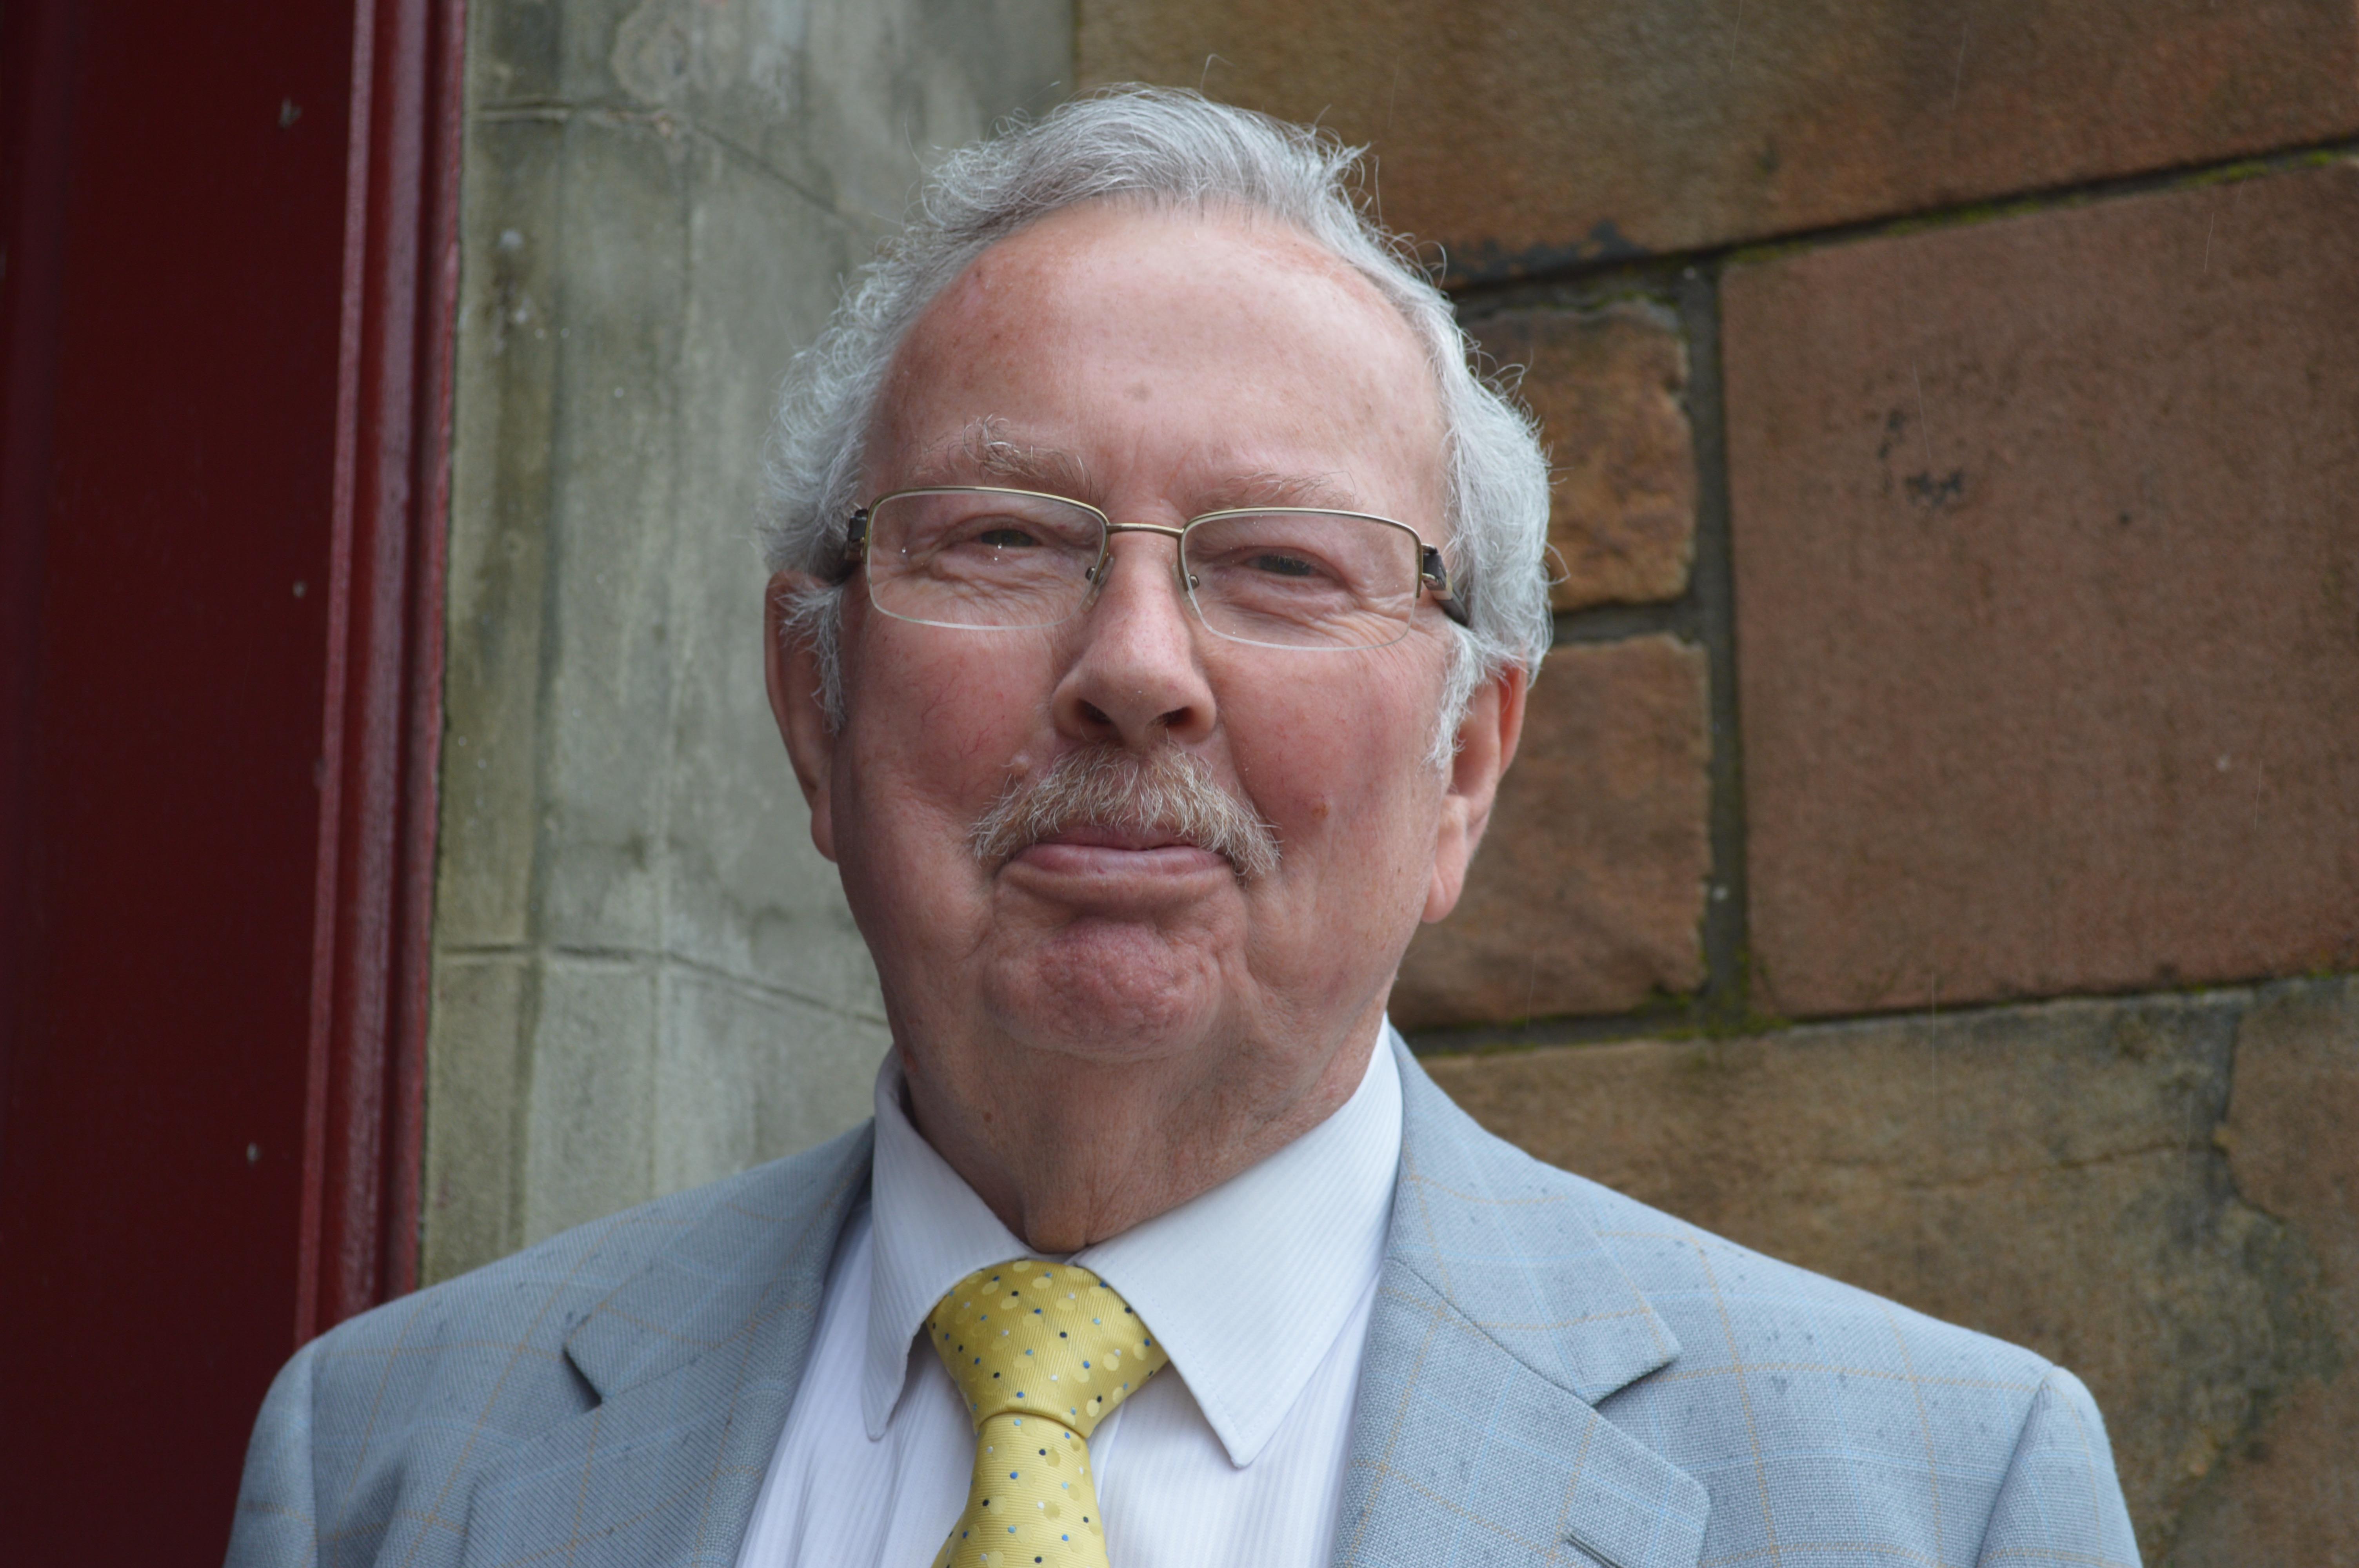 James Donaldson